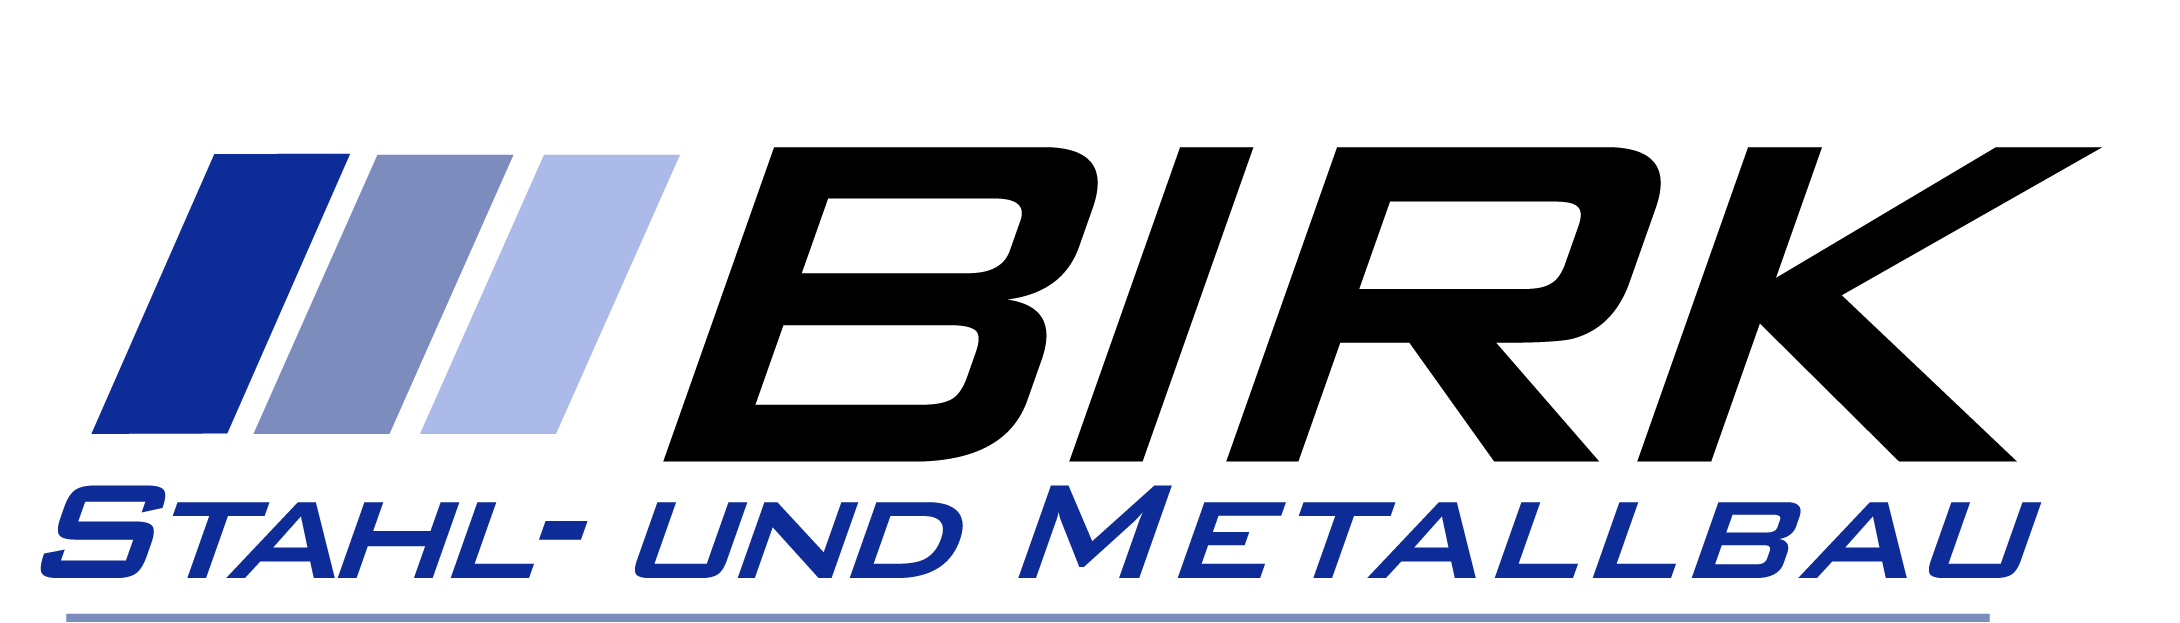 logo_metallbau_birk